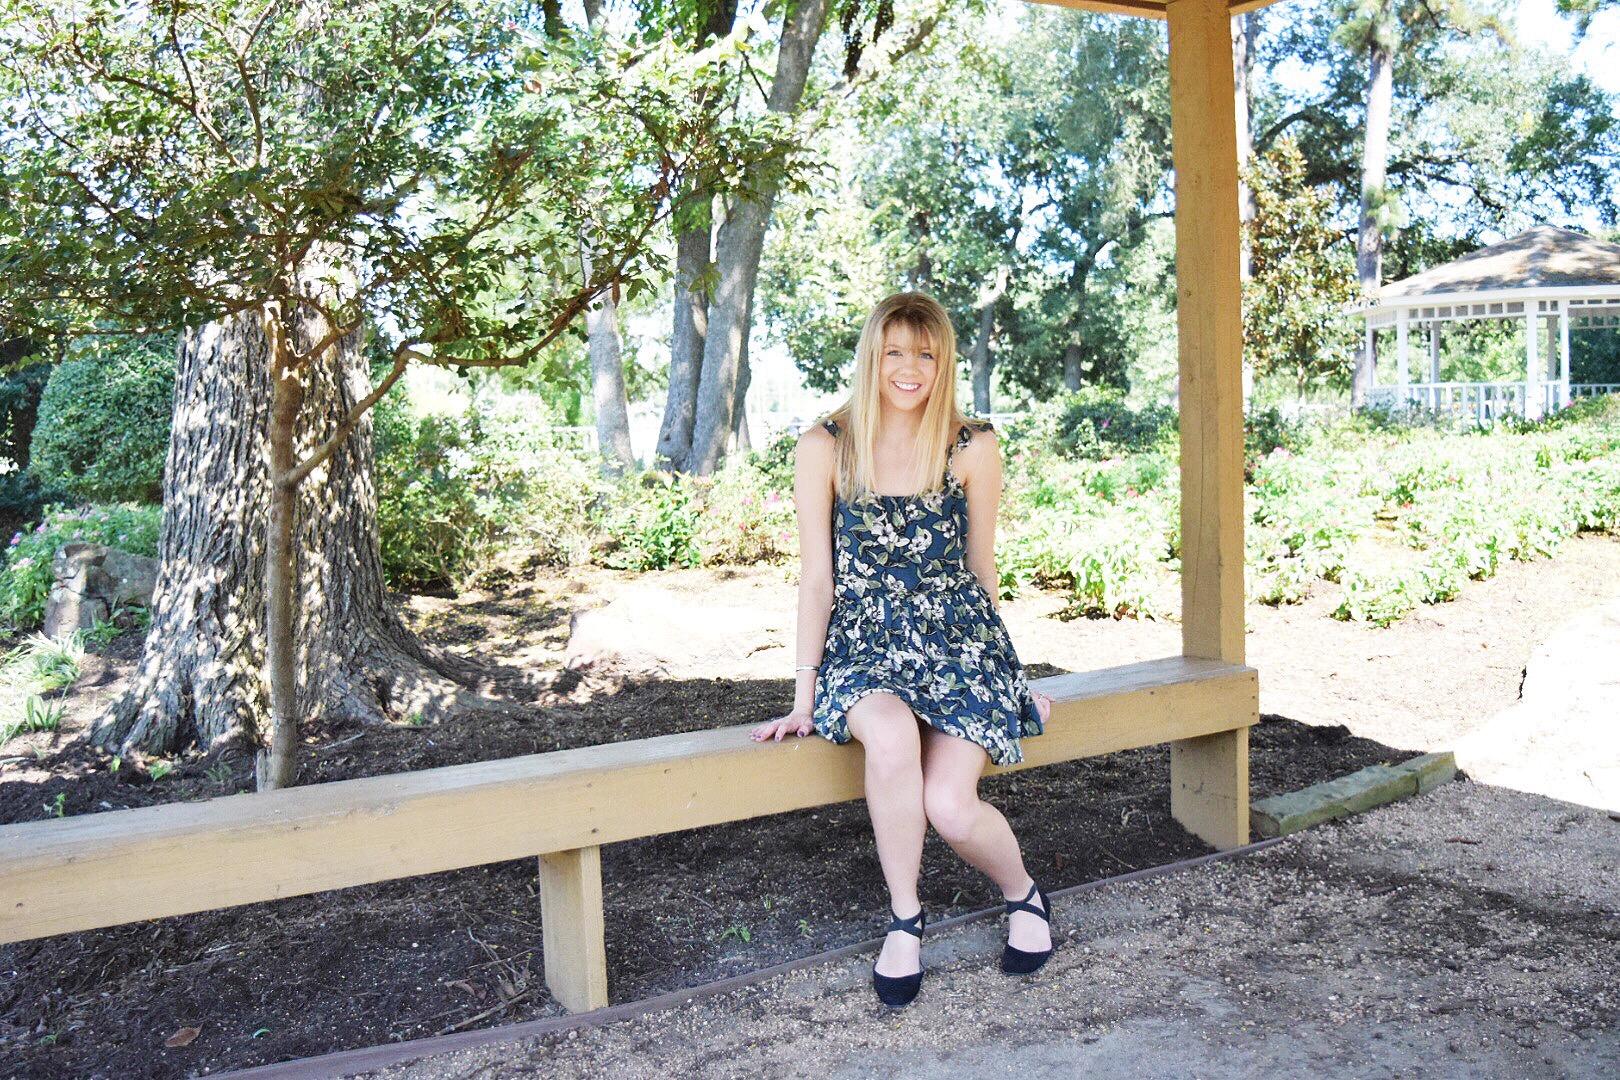 Houston Fashion Blogger - Wander Dust - How to (2).JPG